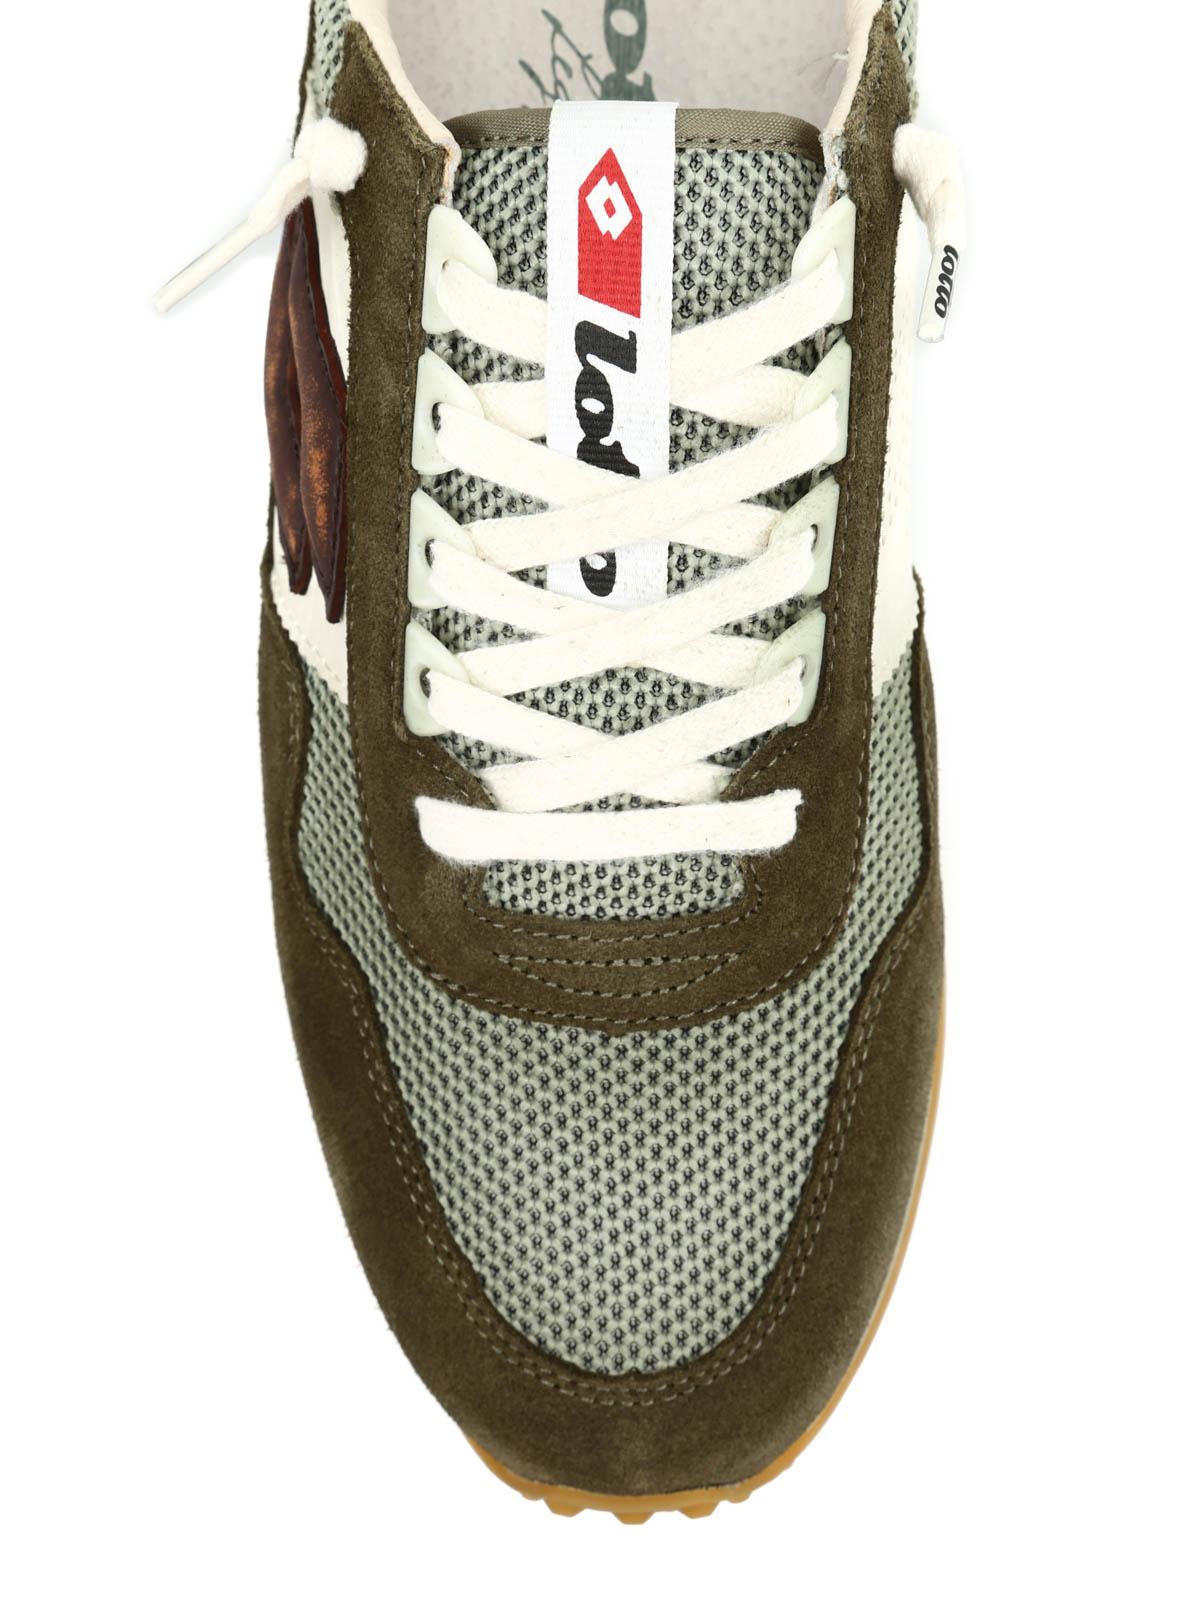 Lo s3002 Lotto Tokyo Sneakers p16 Targa Sneaker Leggenda qXUz74P